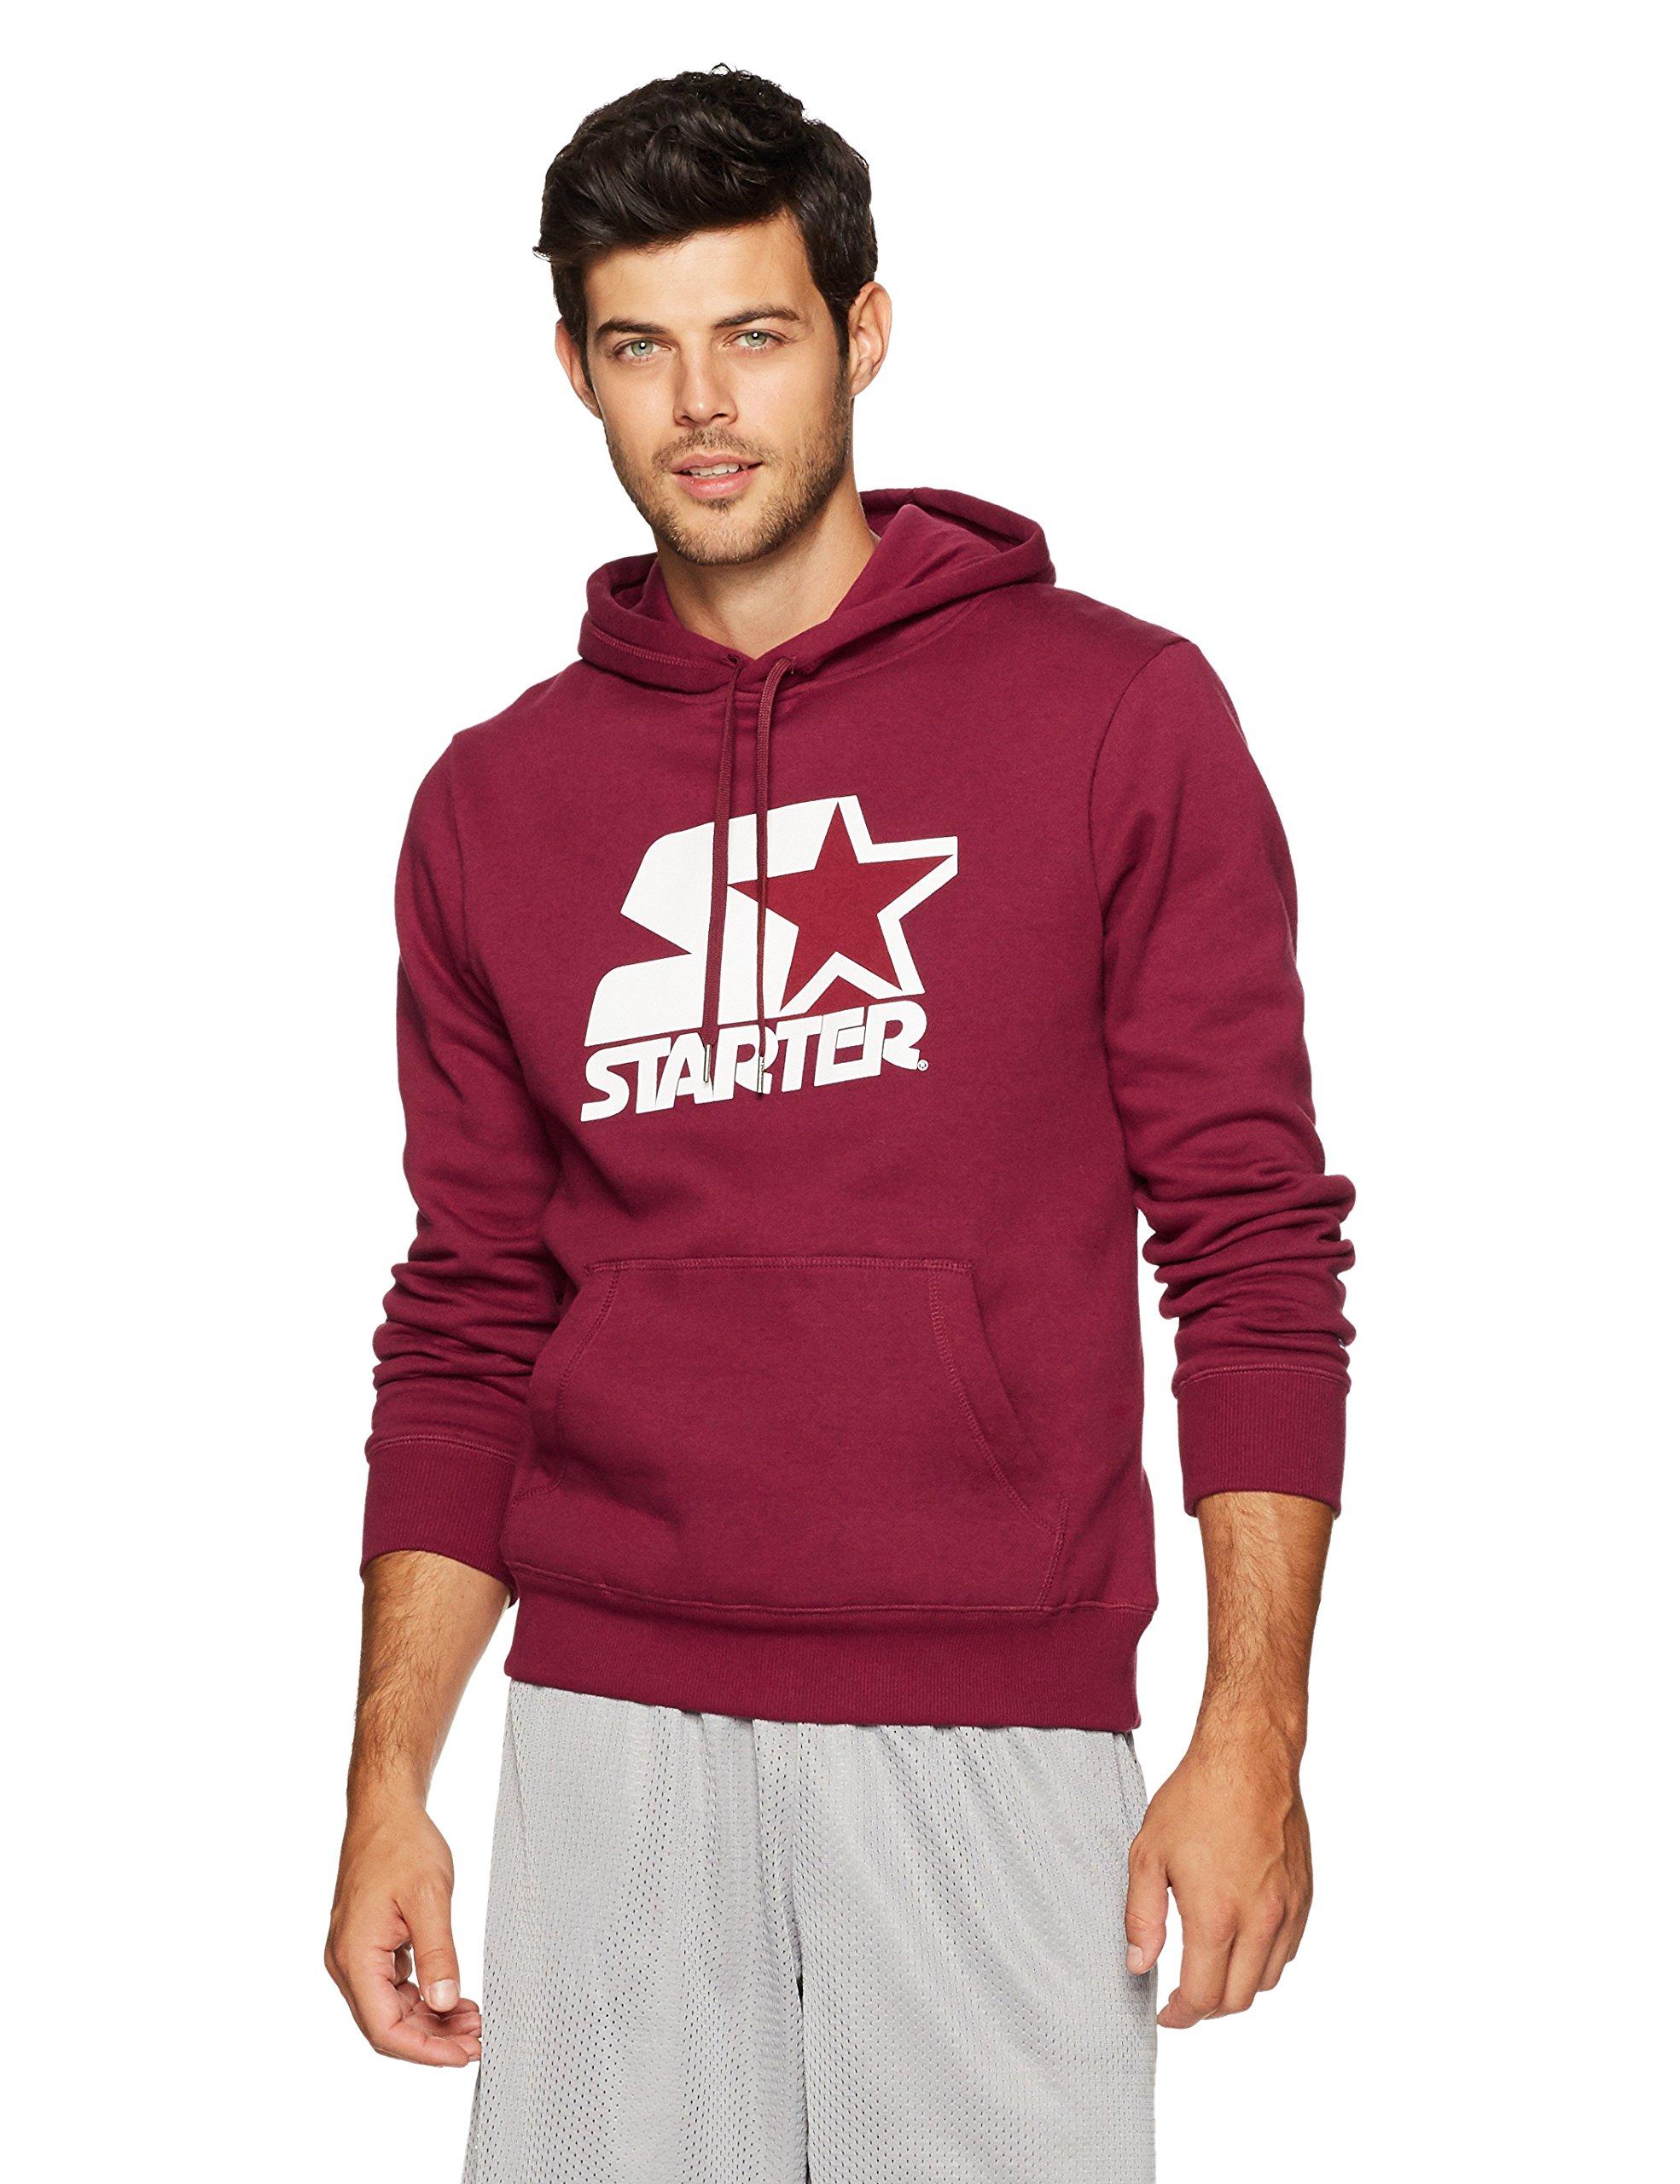 Starter Men's Pullover Logo Hoodie, Prime Exclusive, Team Maroon, Medium